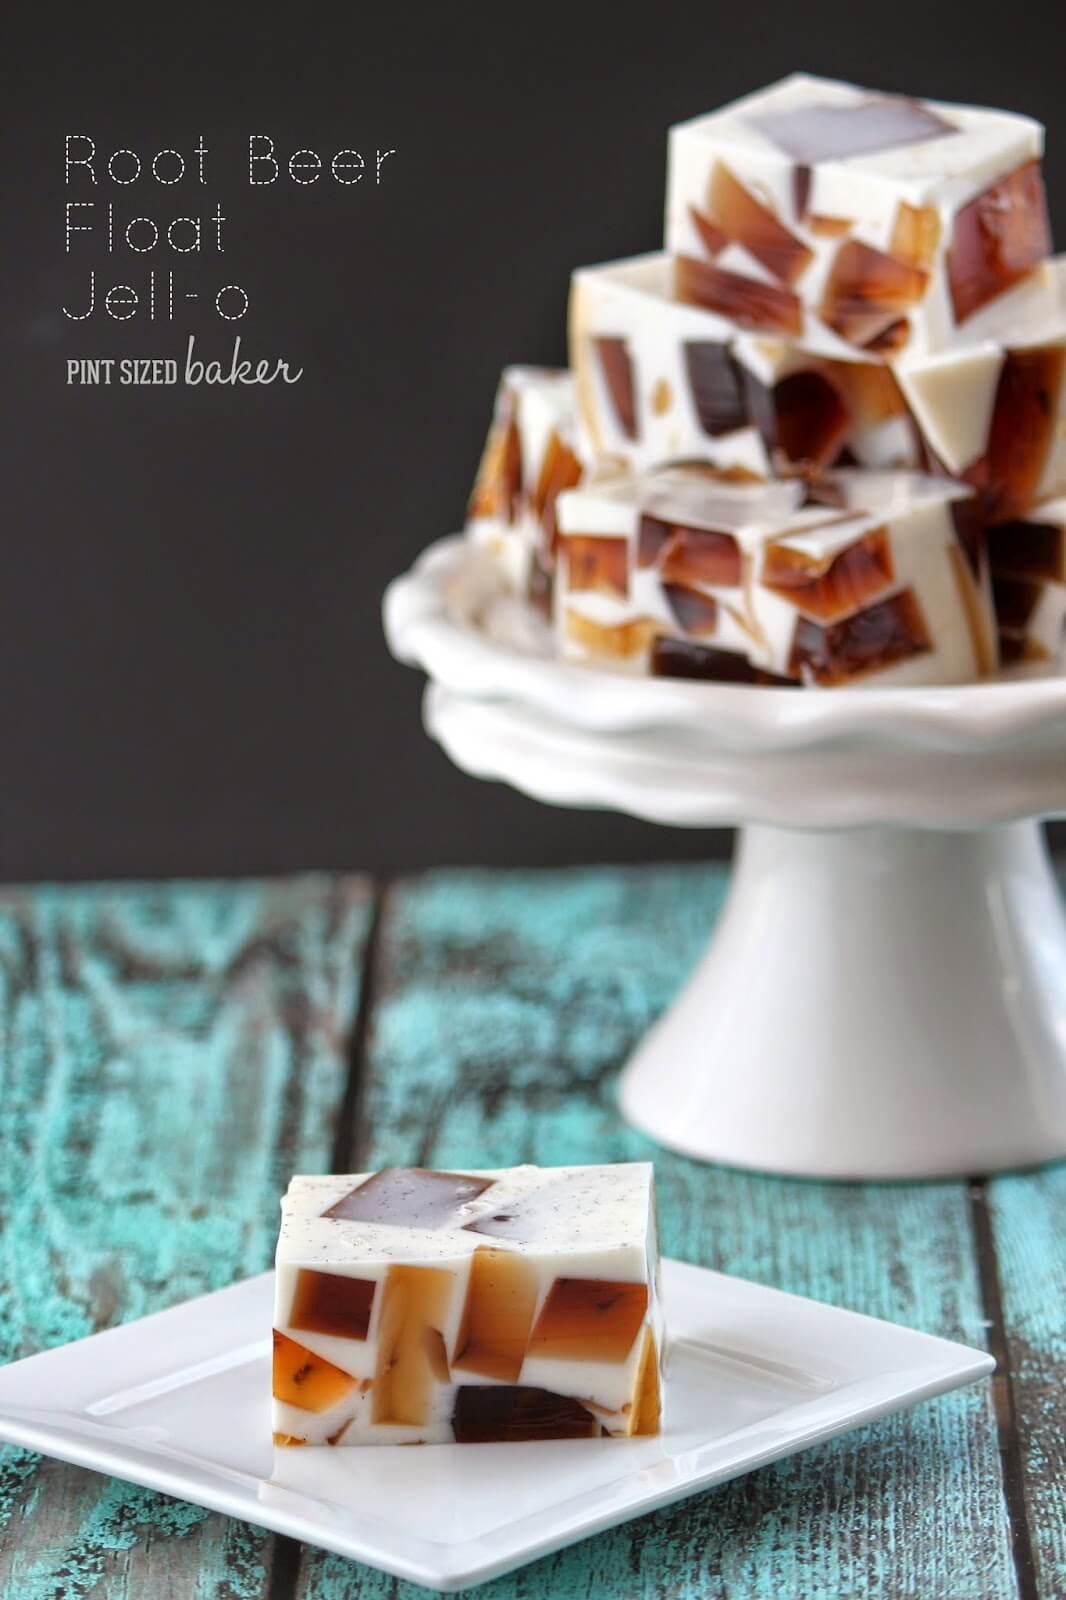 Stupendous Root Beer Float Jello Recipe Pint Sized Baker Funny Birthday Cards Online Unhofree Goldxyz